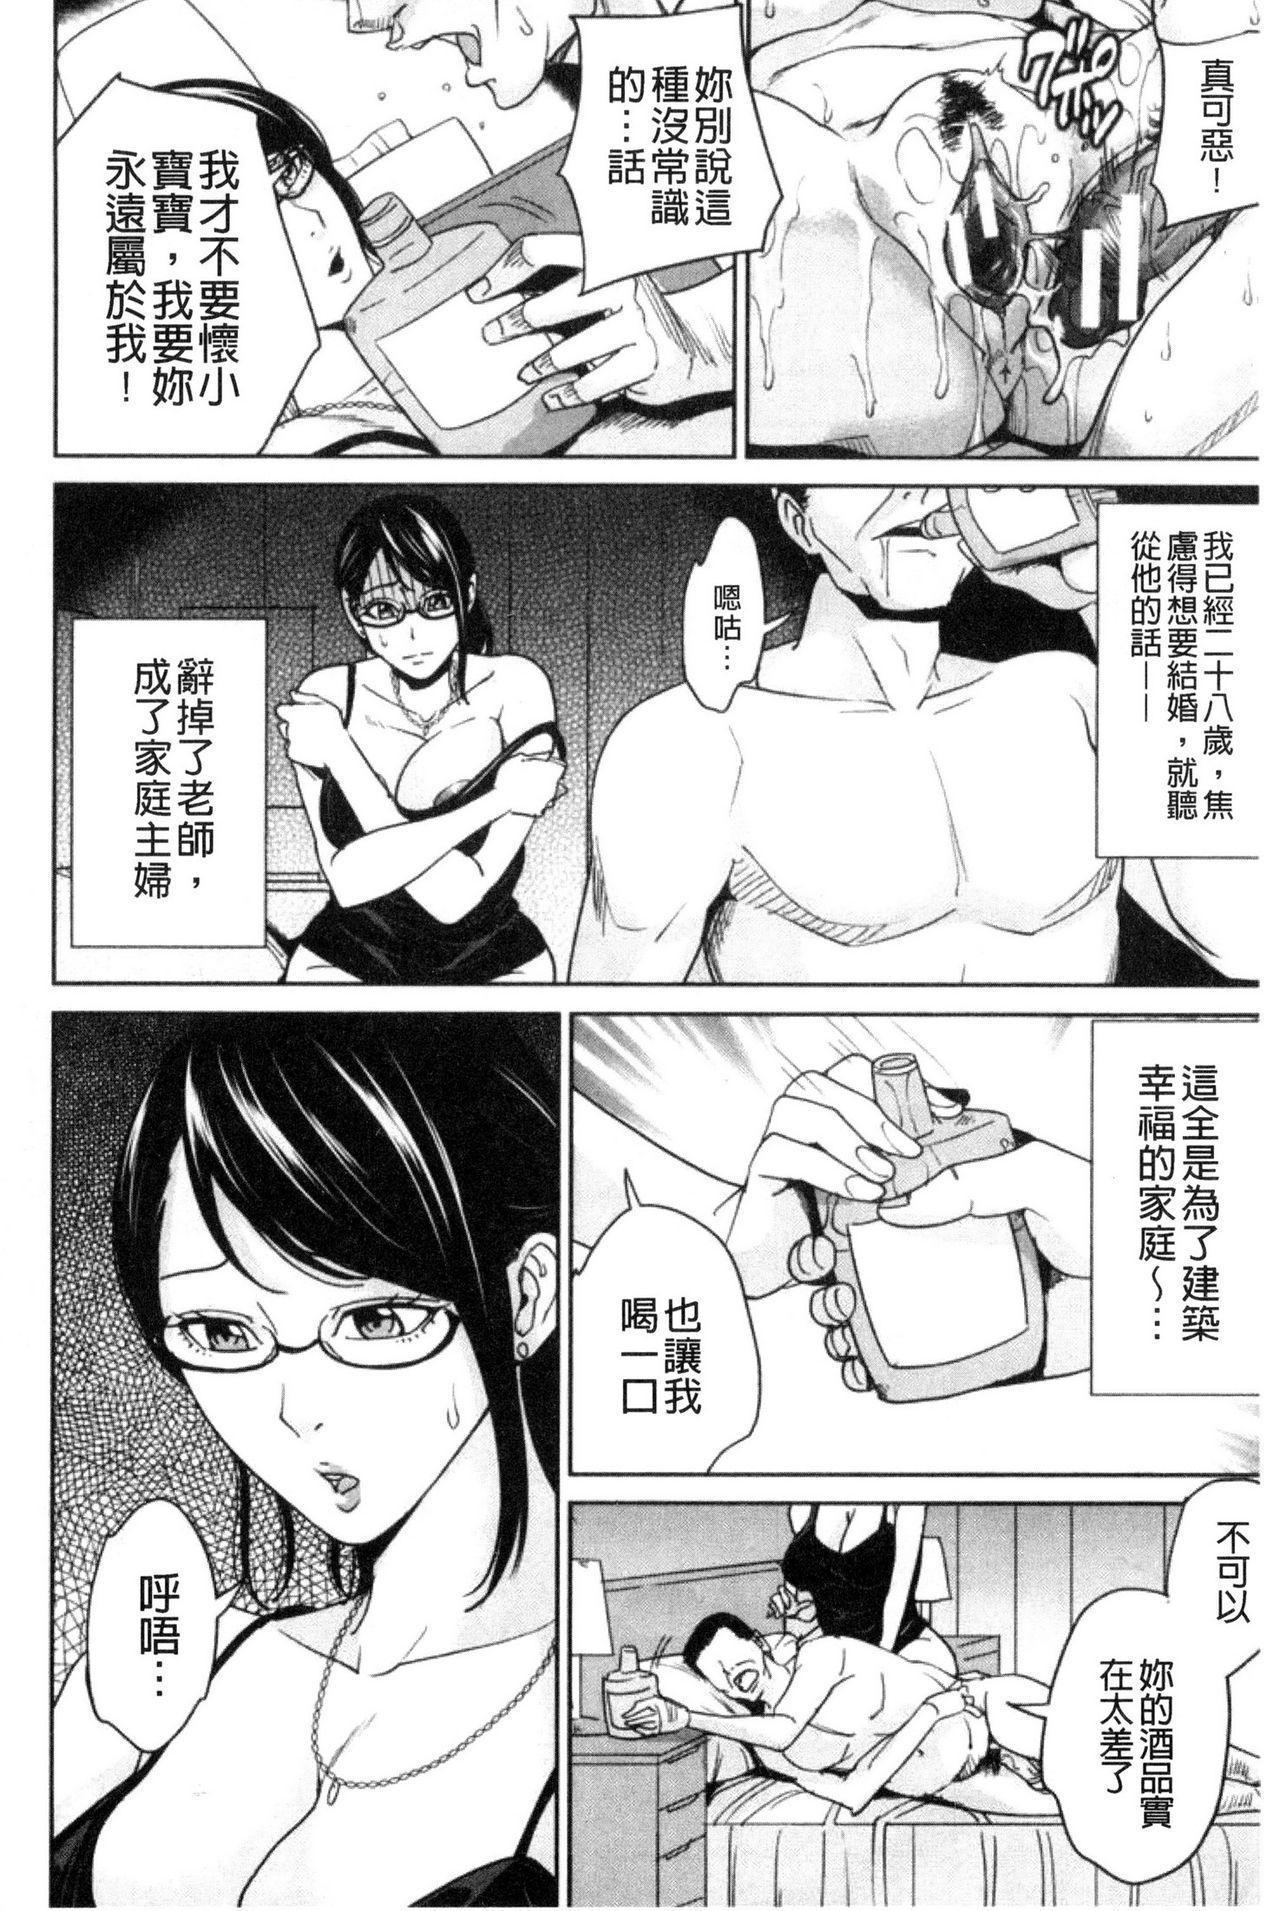 Aniyome Bitch Life   兄嫂淫蕩女性生活 92